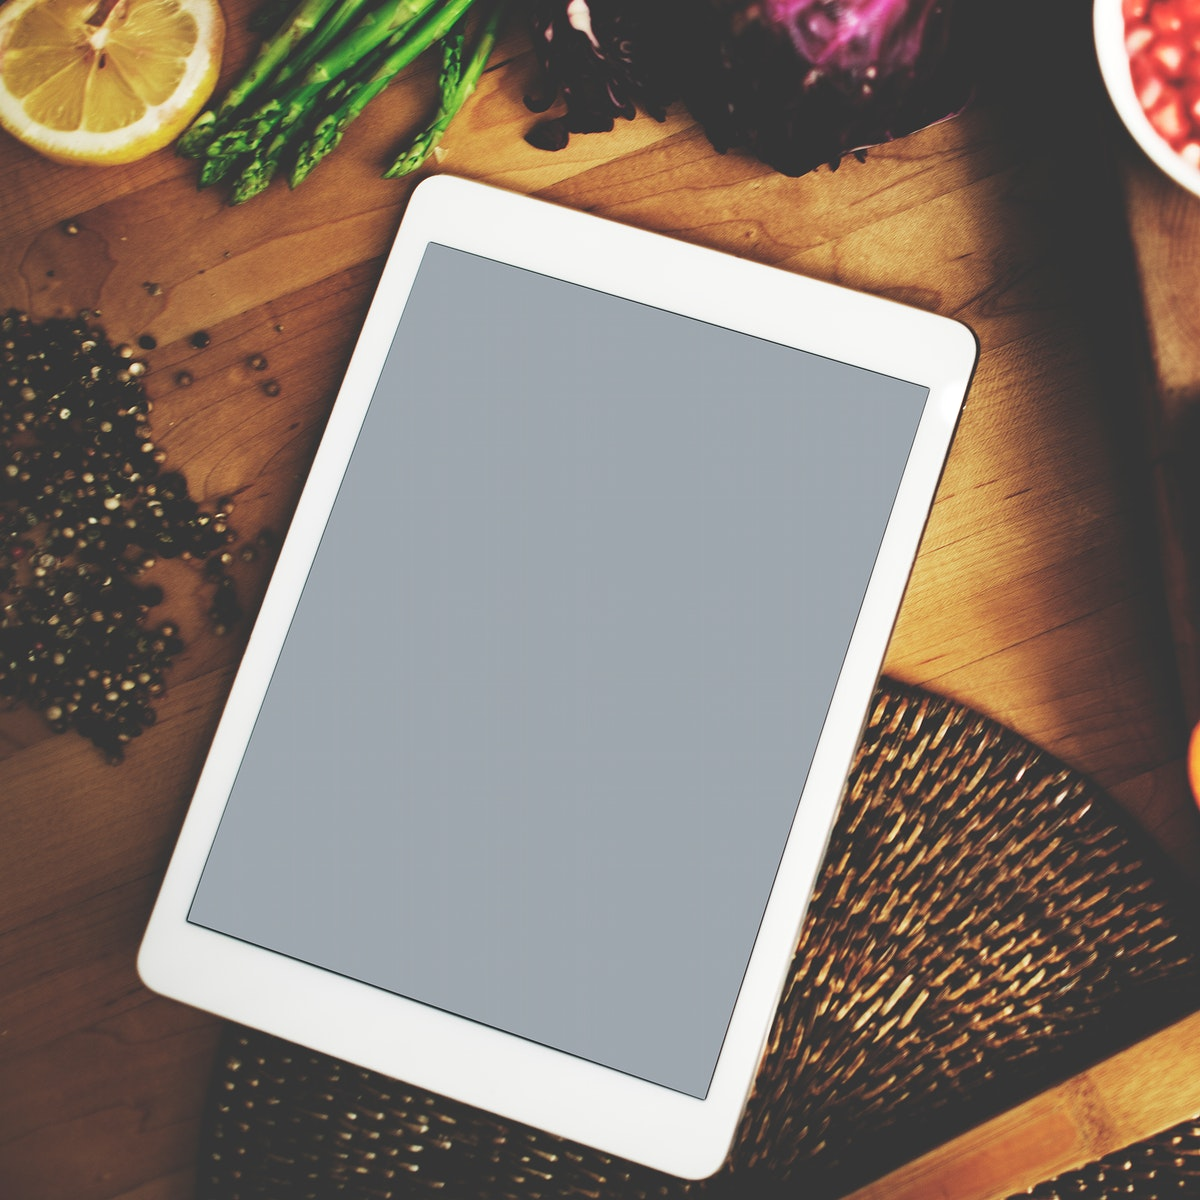 Workspace with digital tablet